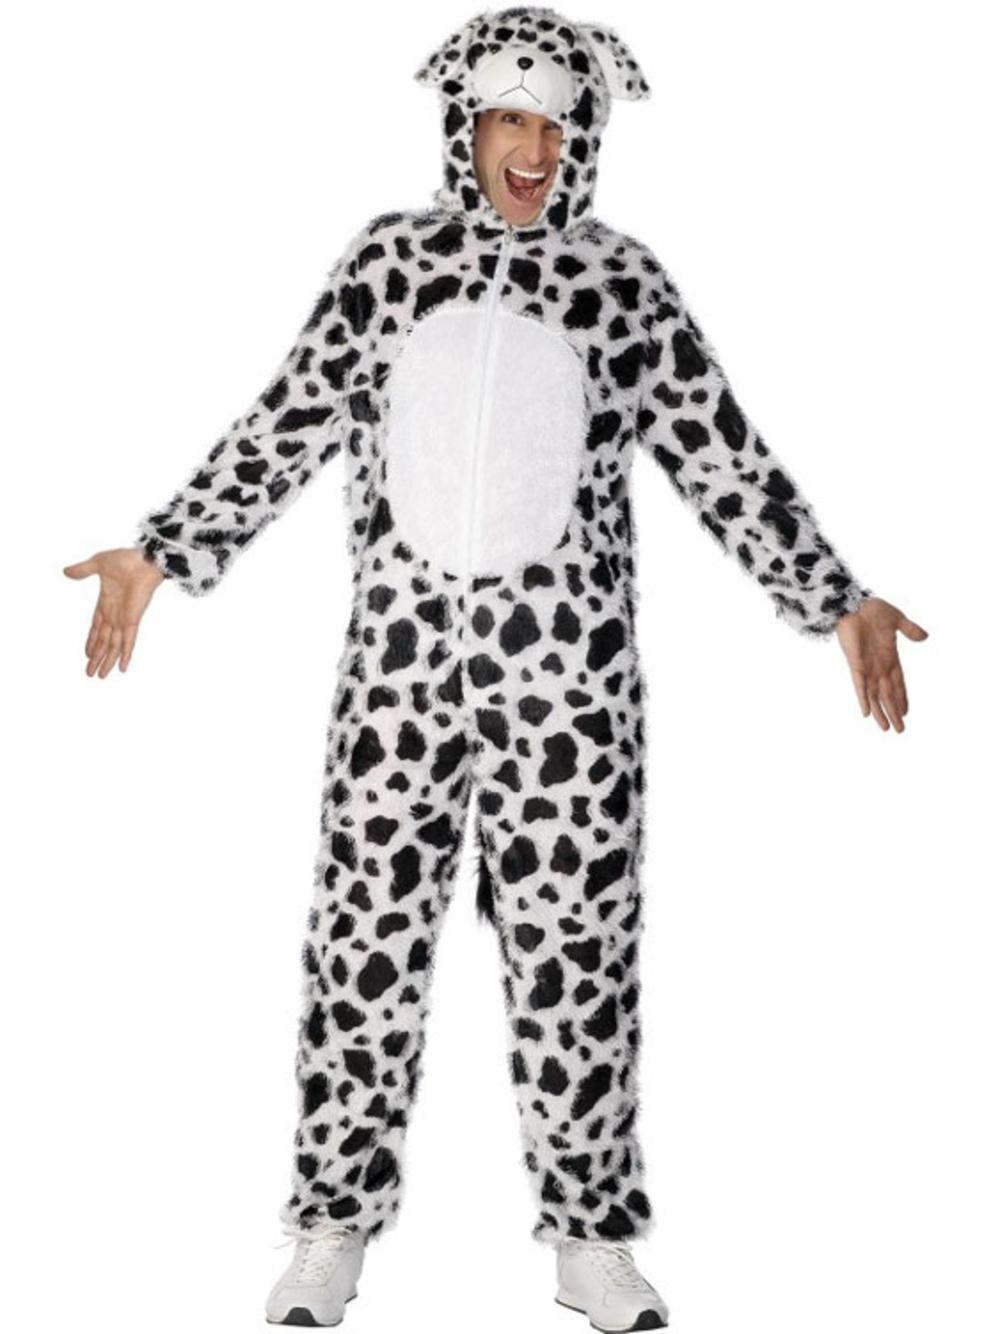 Dalmatian Dog Costume Adult Mens Ladies Fancy Dress Book Dalmation Costume NEW